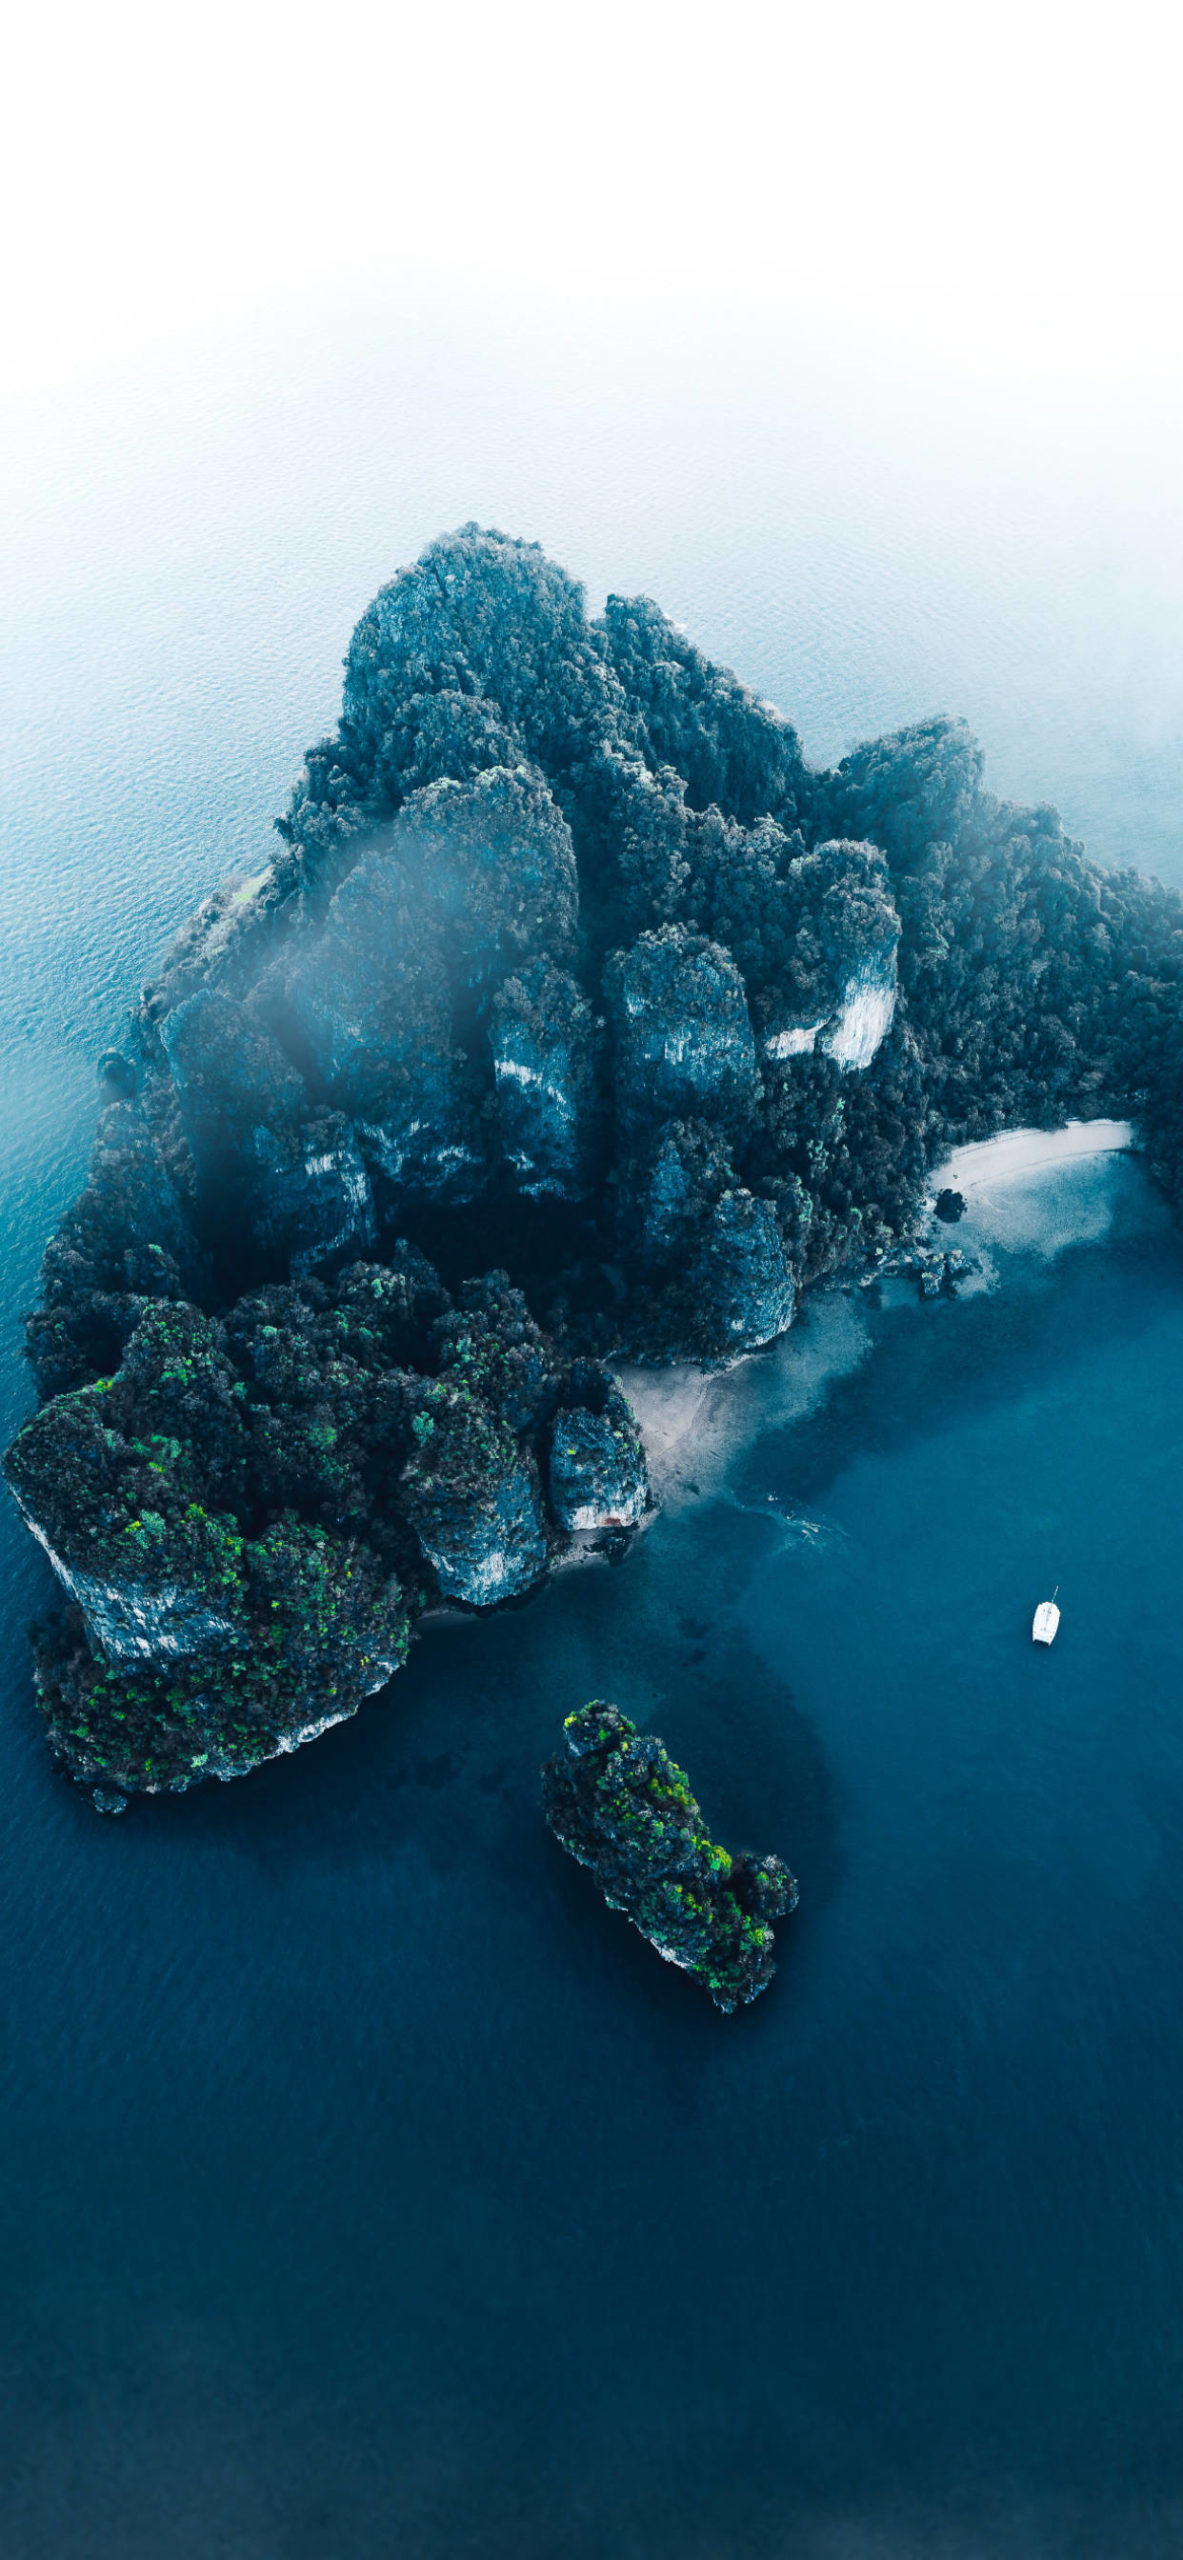 iPhone wallpapers island straits of malaca scaled Island